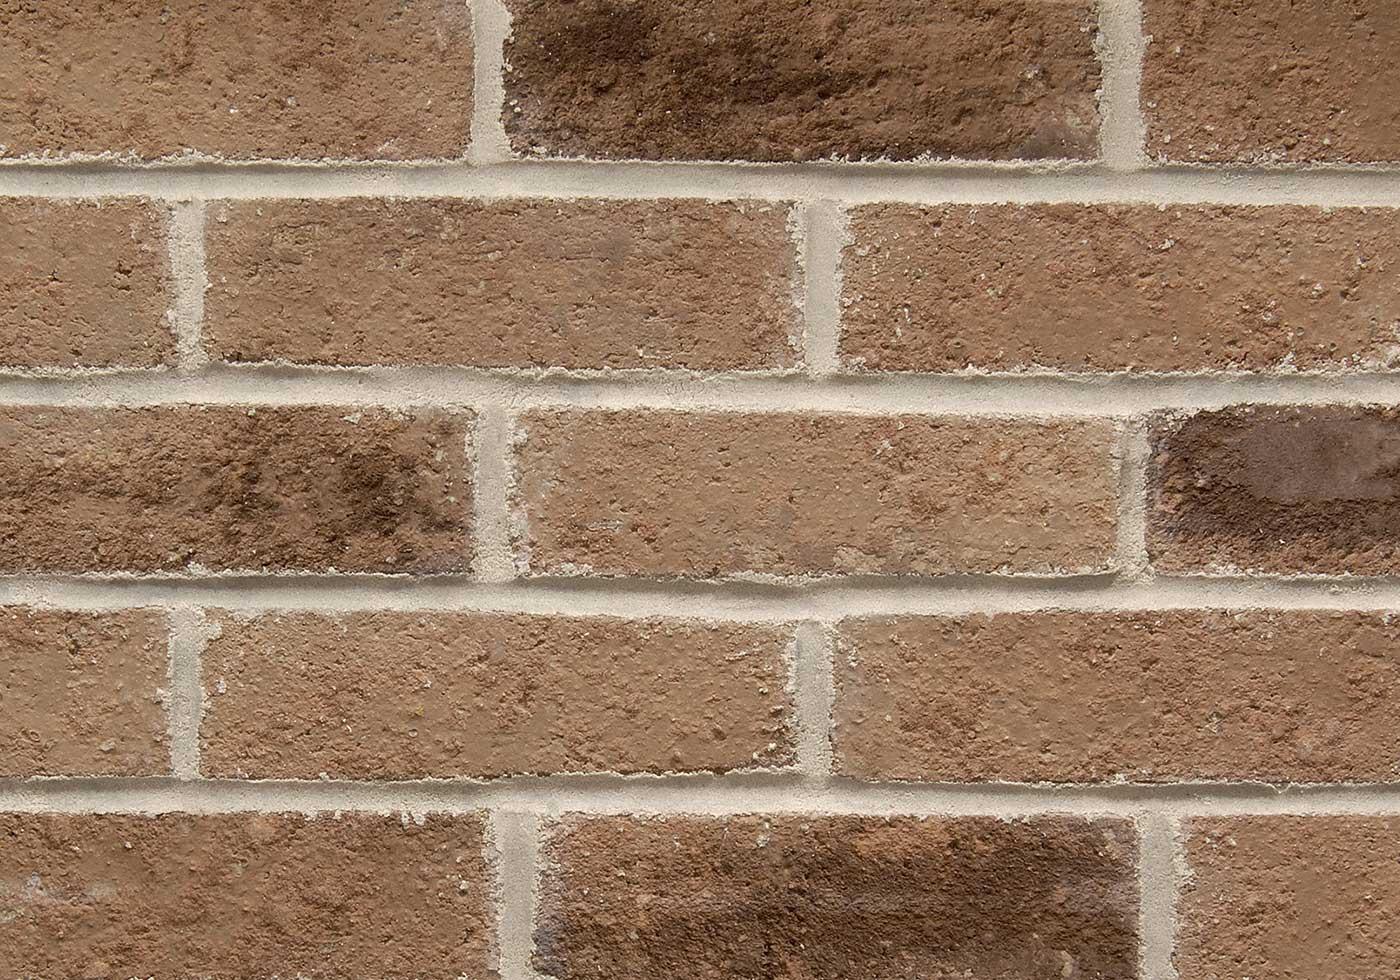 Georgetown brick close-up